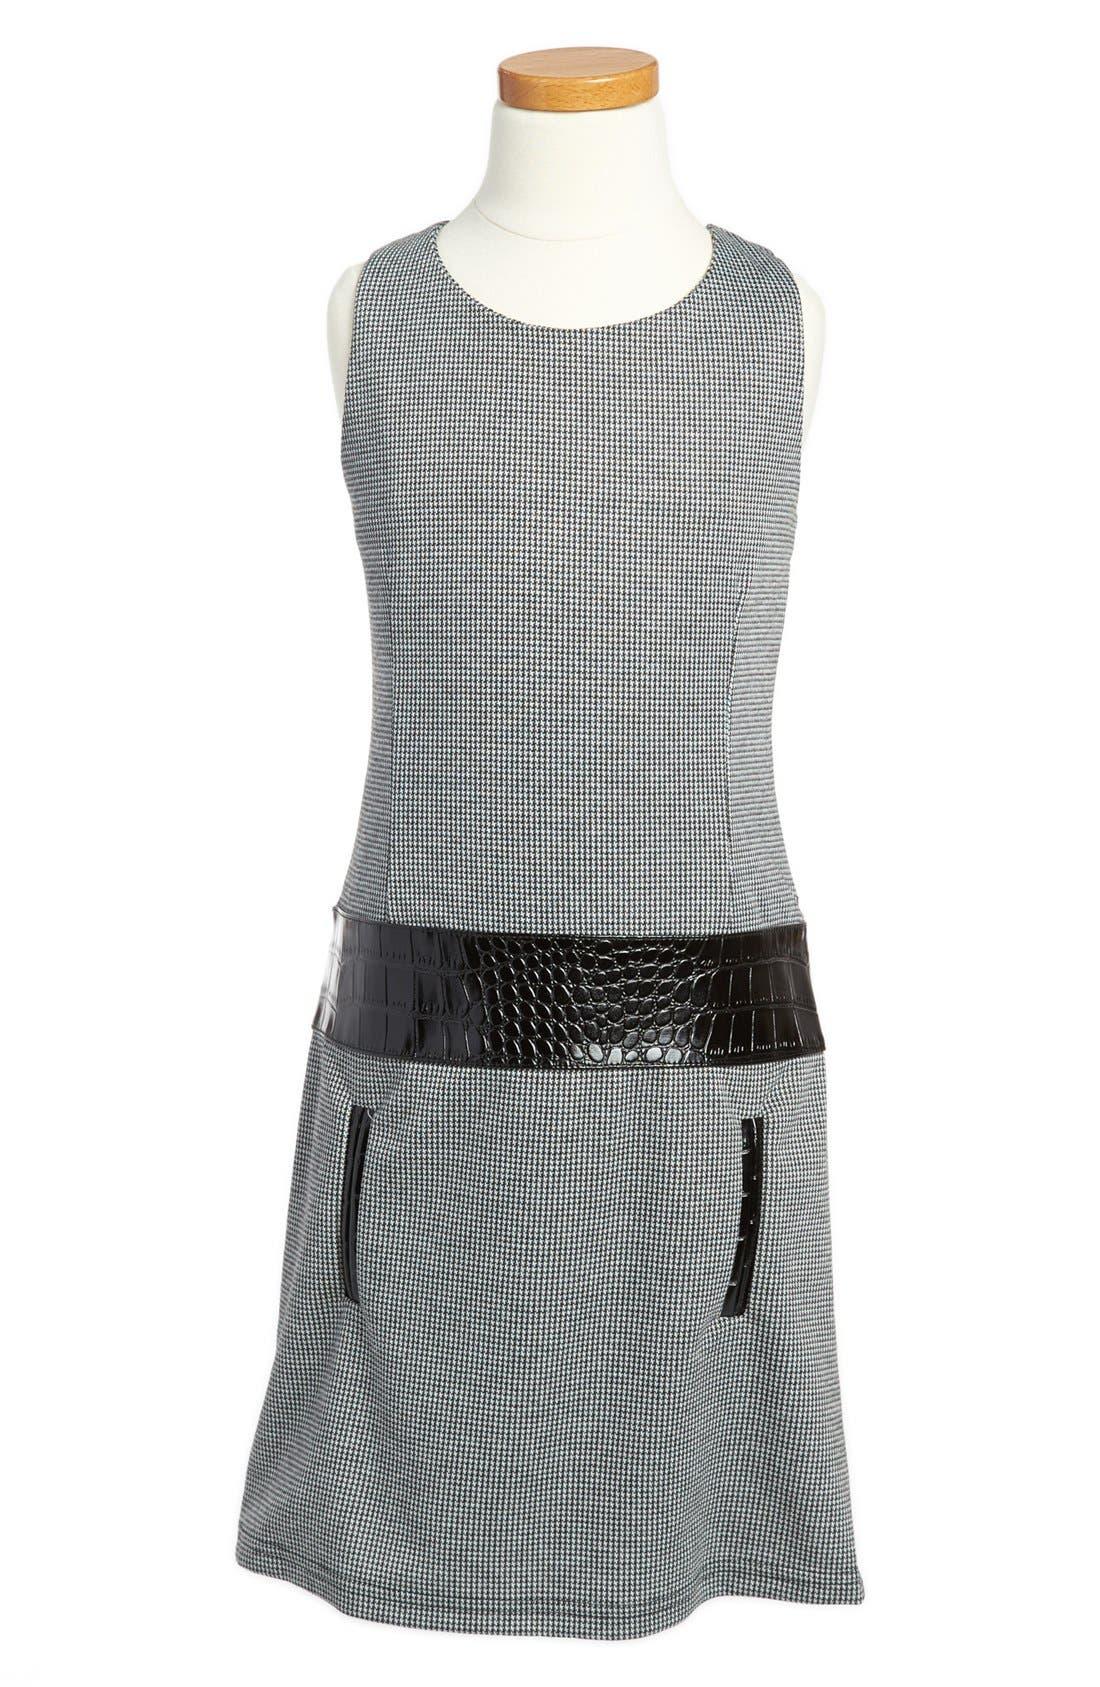 Alternate Image 1 Selected - Laundry by Shelli Segal Drop Waist Dress